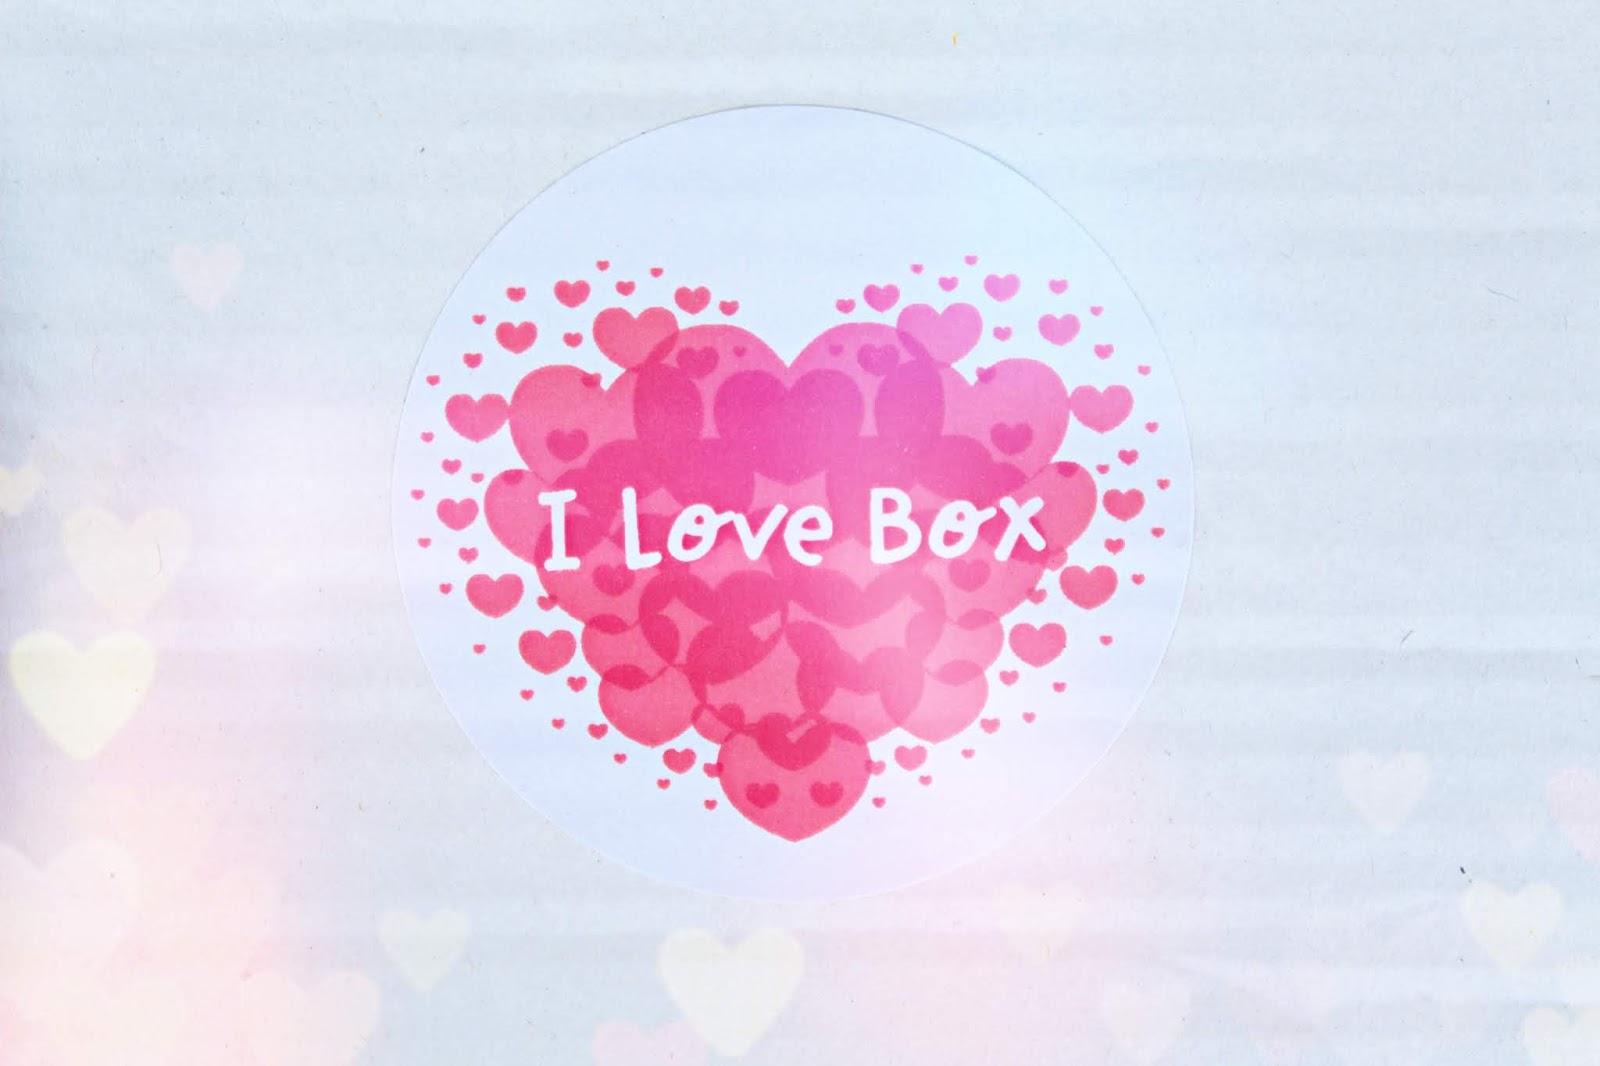 I LOVE BOX by Agata - unboxing pudełka - lipiec 2019